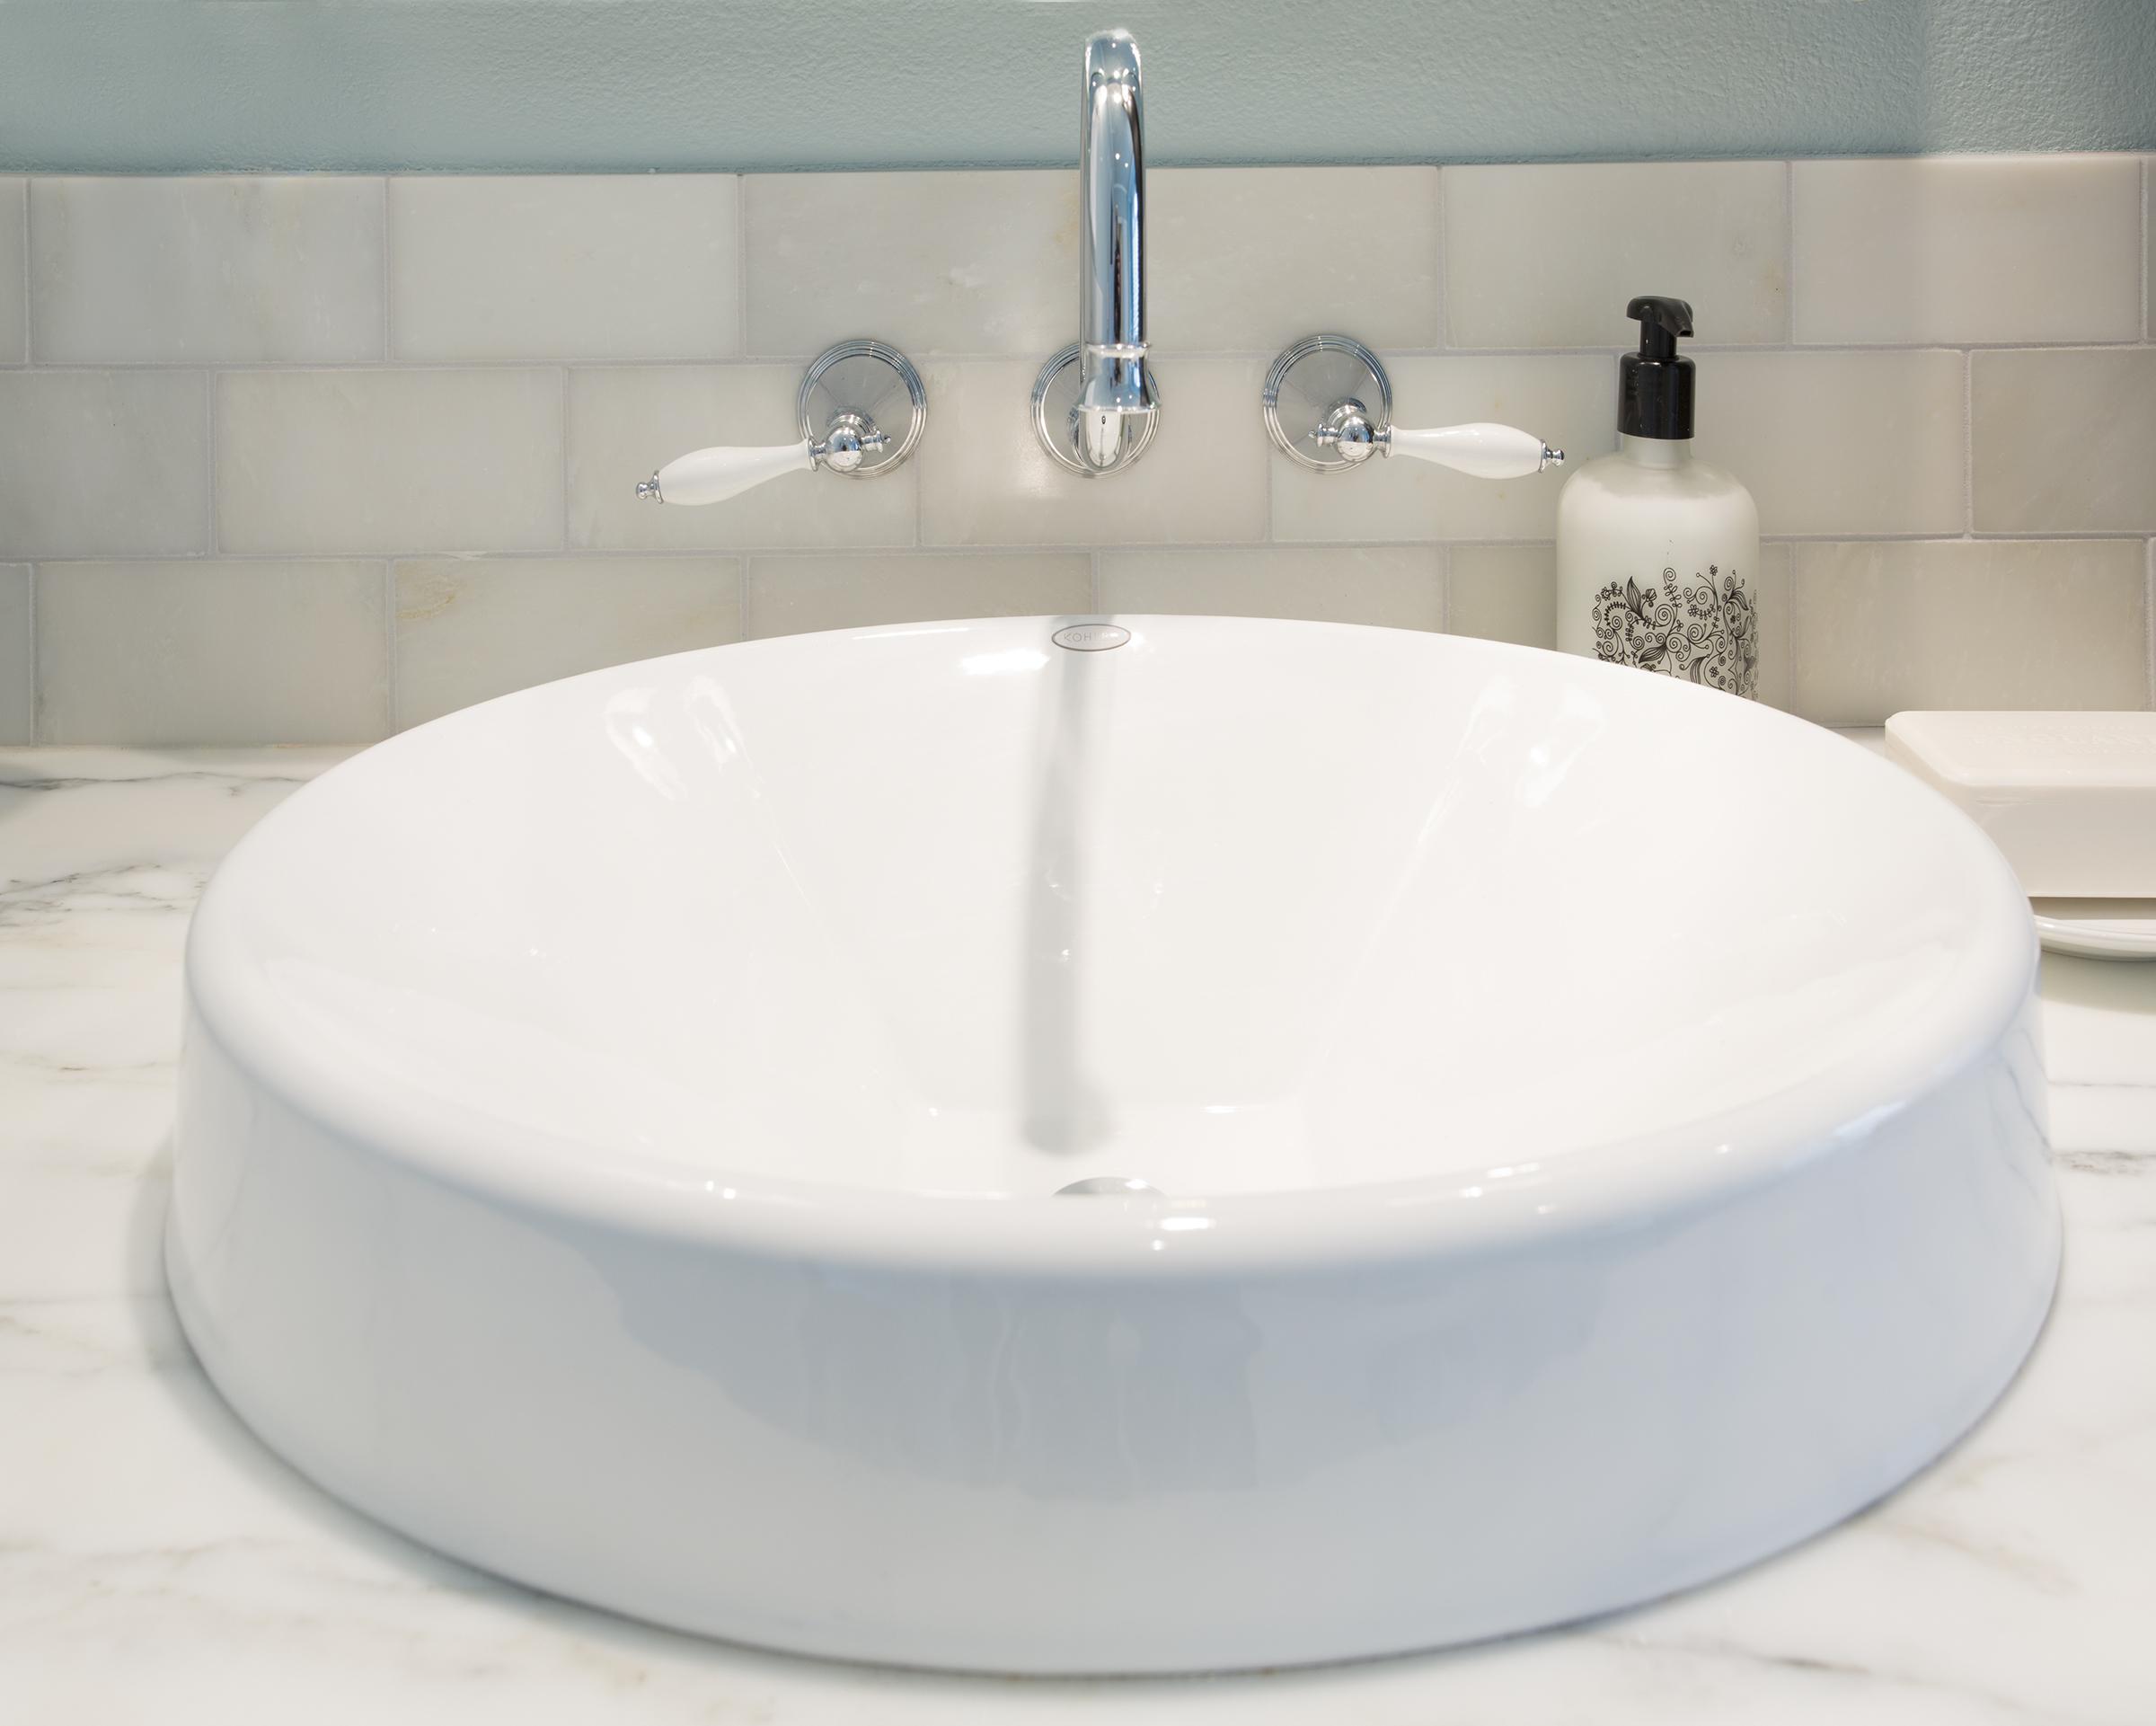 Bath 4  - Copy.jpg